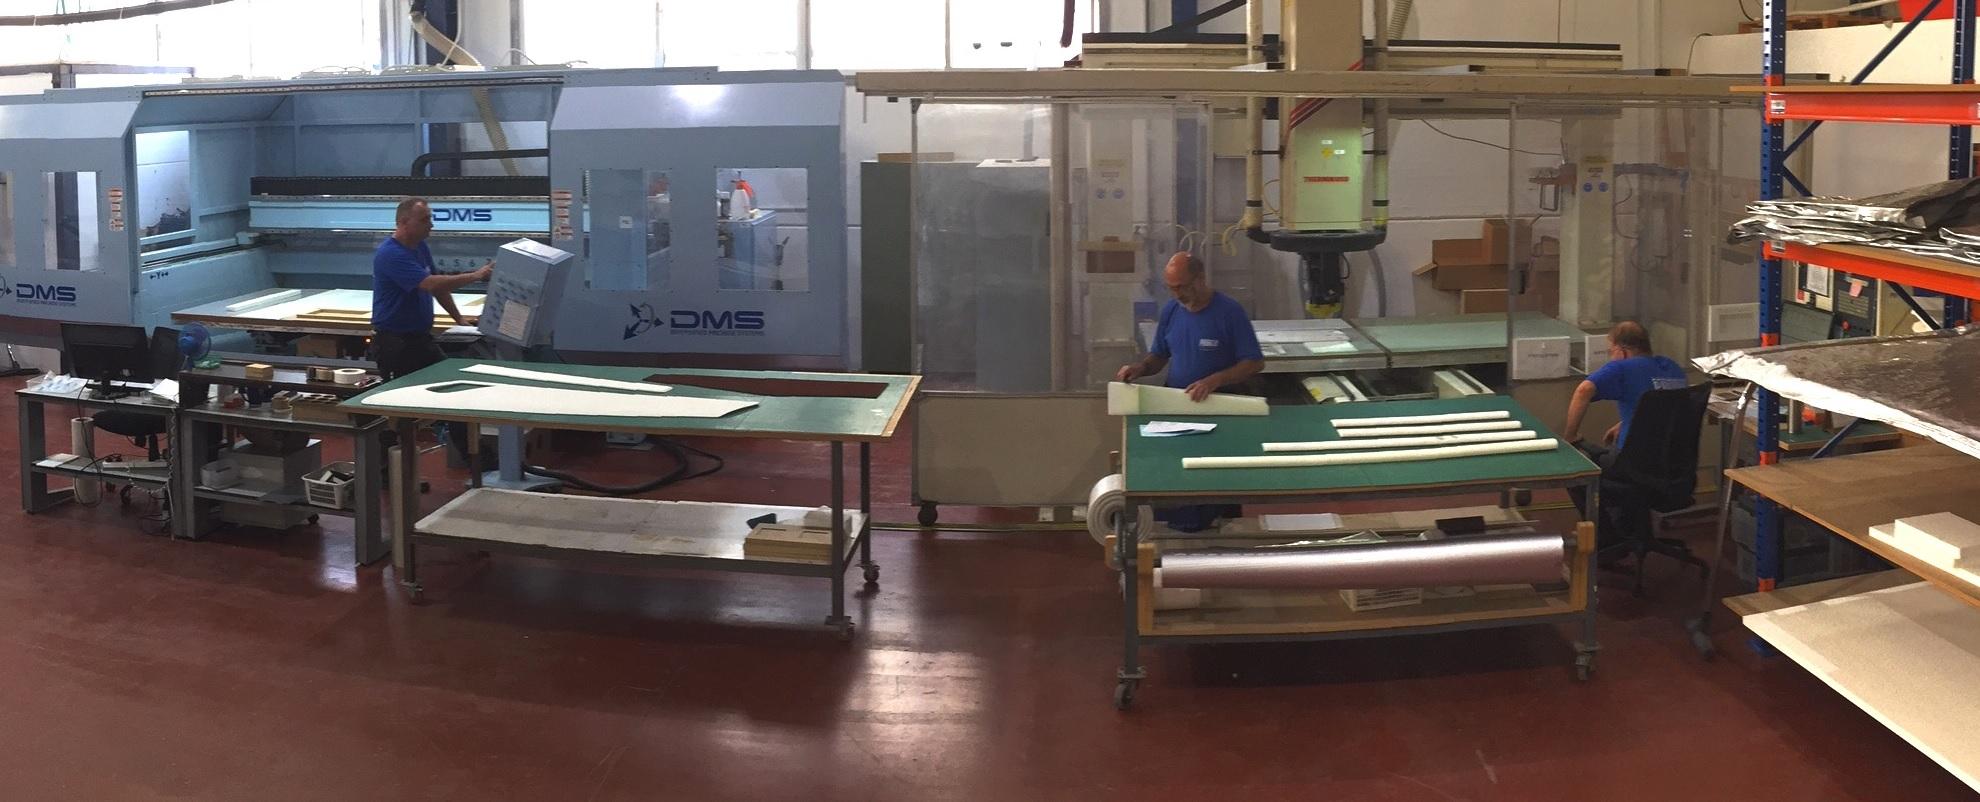 new-CNC-Machine-shop-23.8.1712